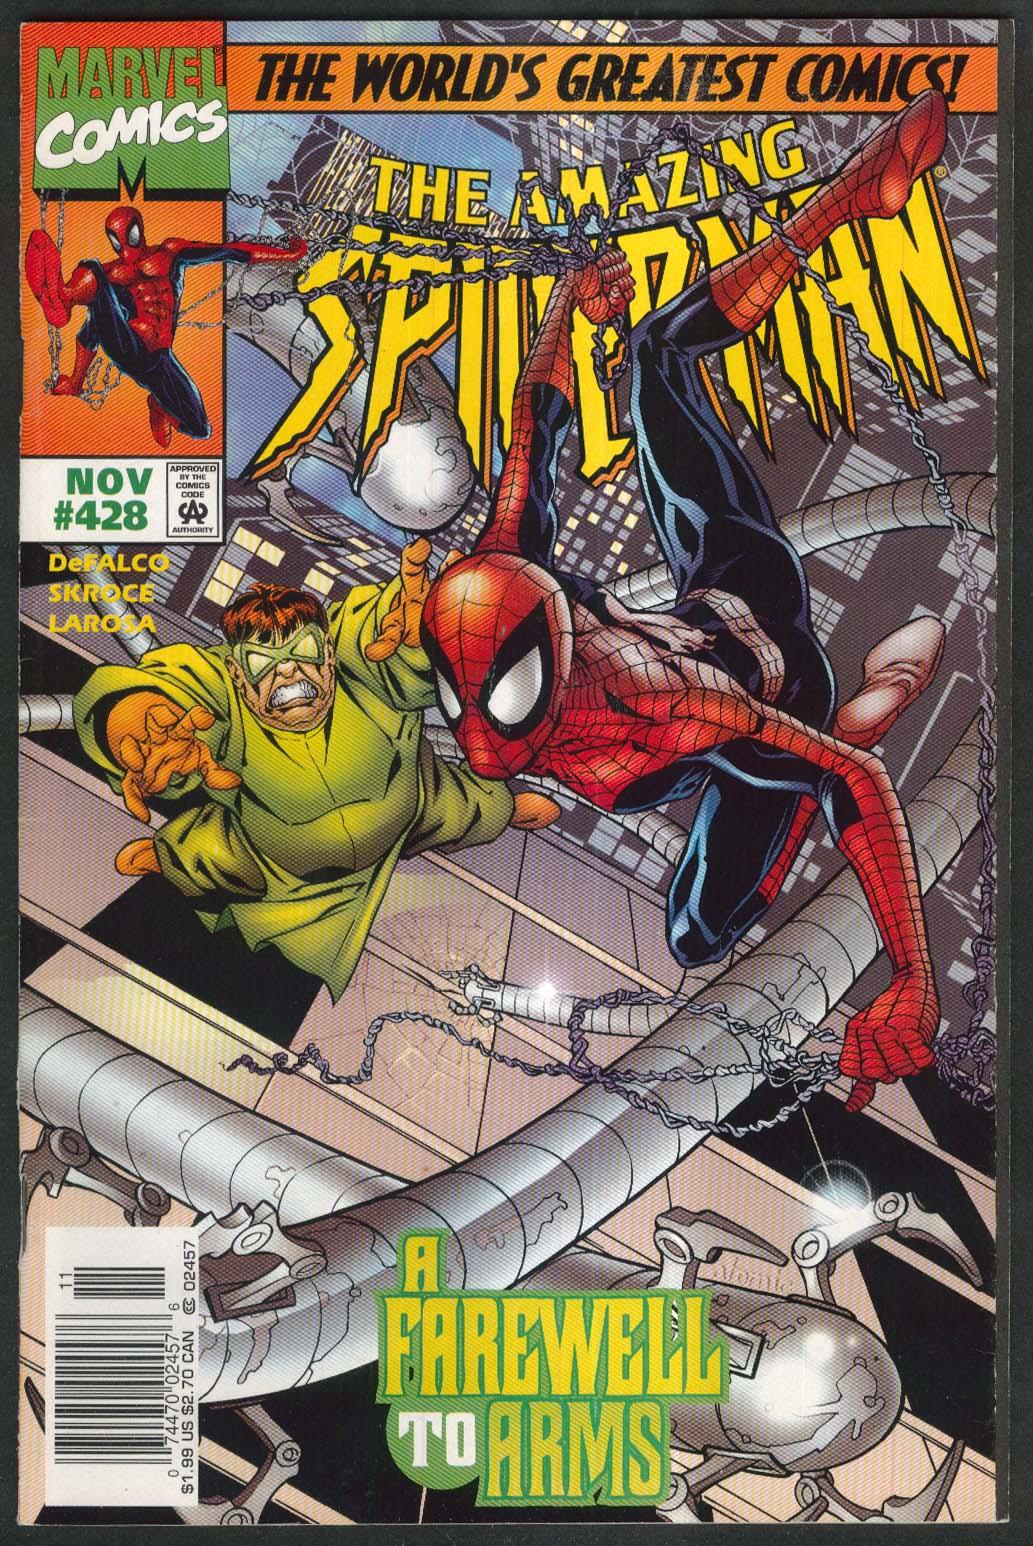 AMAZING SPIDER-MAN #428 Marvel comic book 11 1997